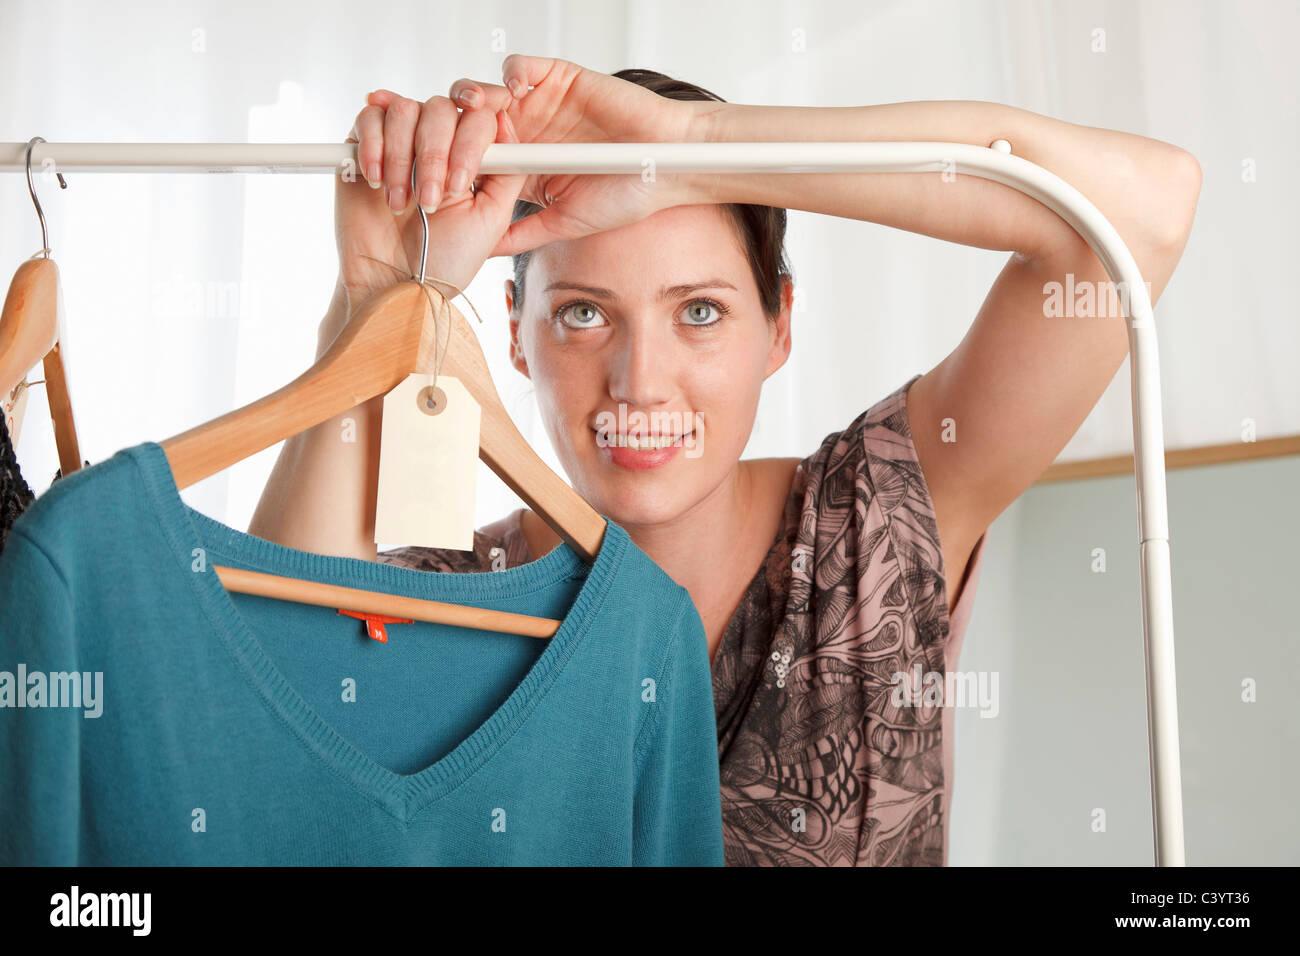 woman holding clothing rail - Stock Image